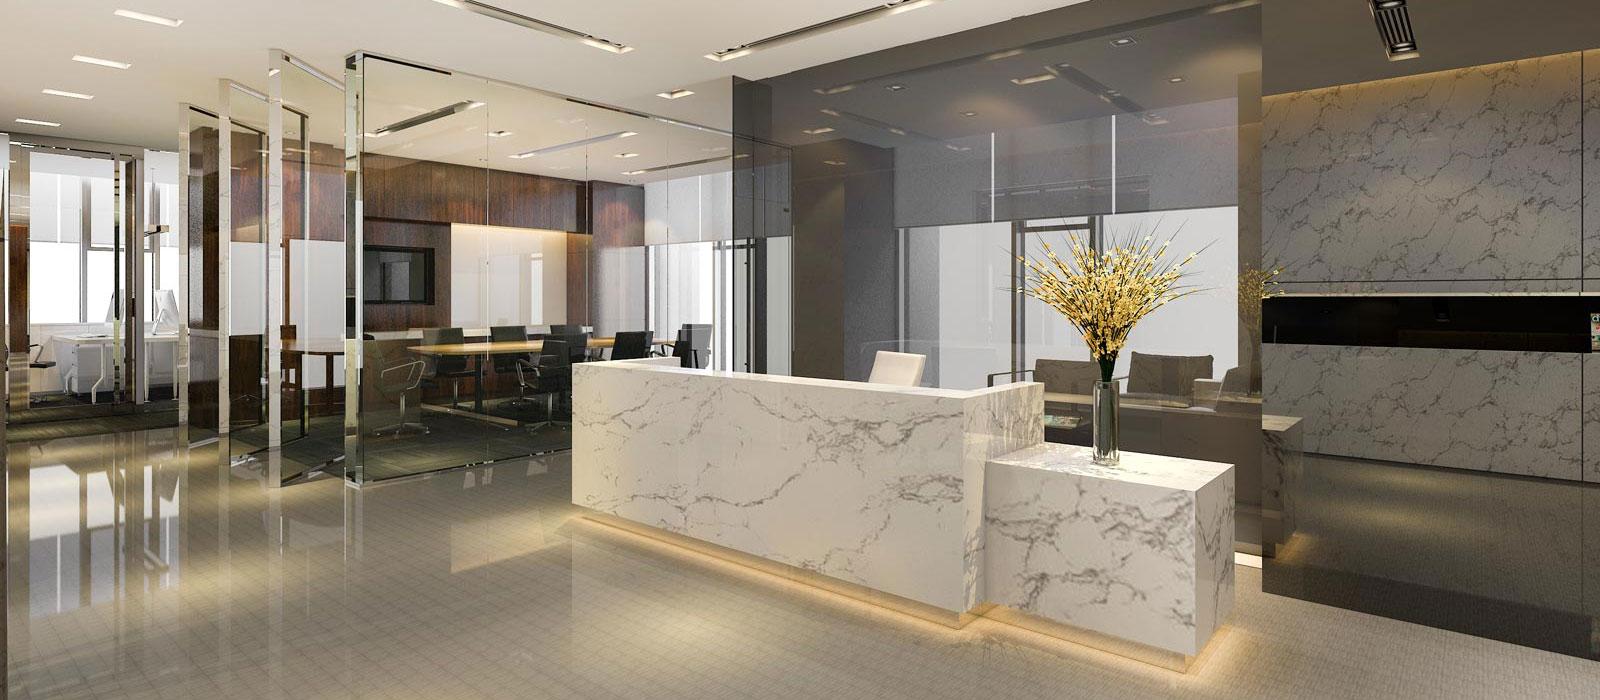 Resource Commercial Advisors - Landlord Representation